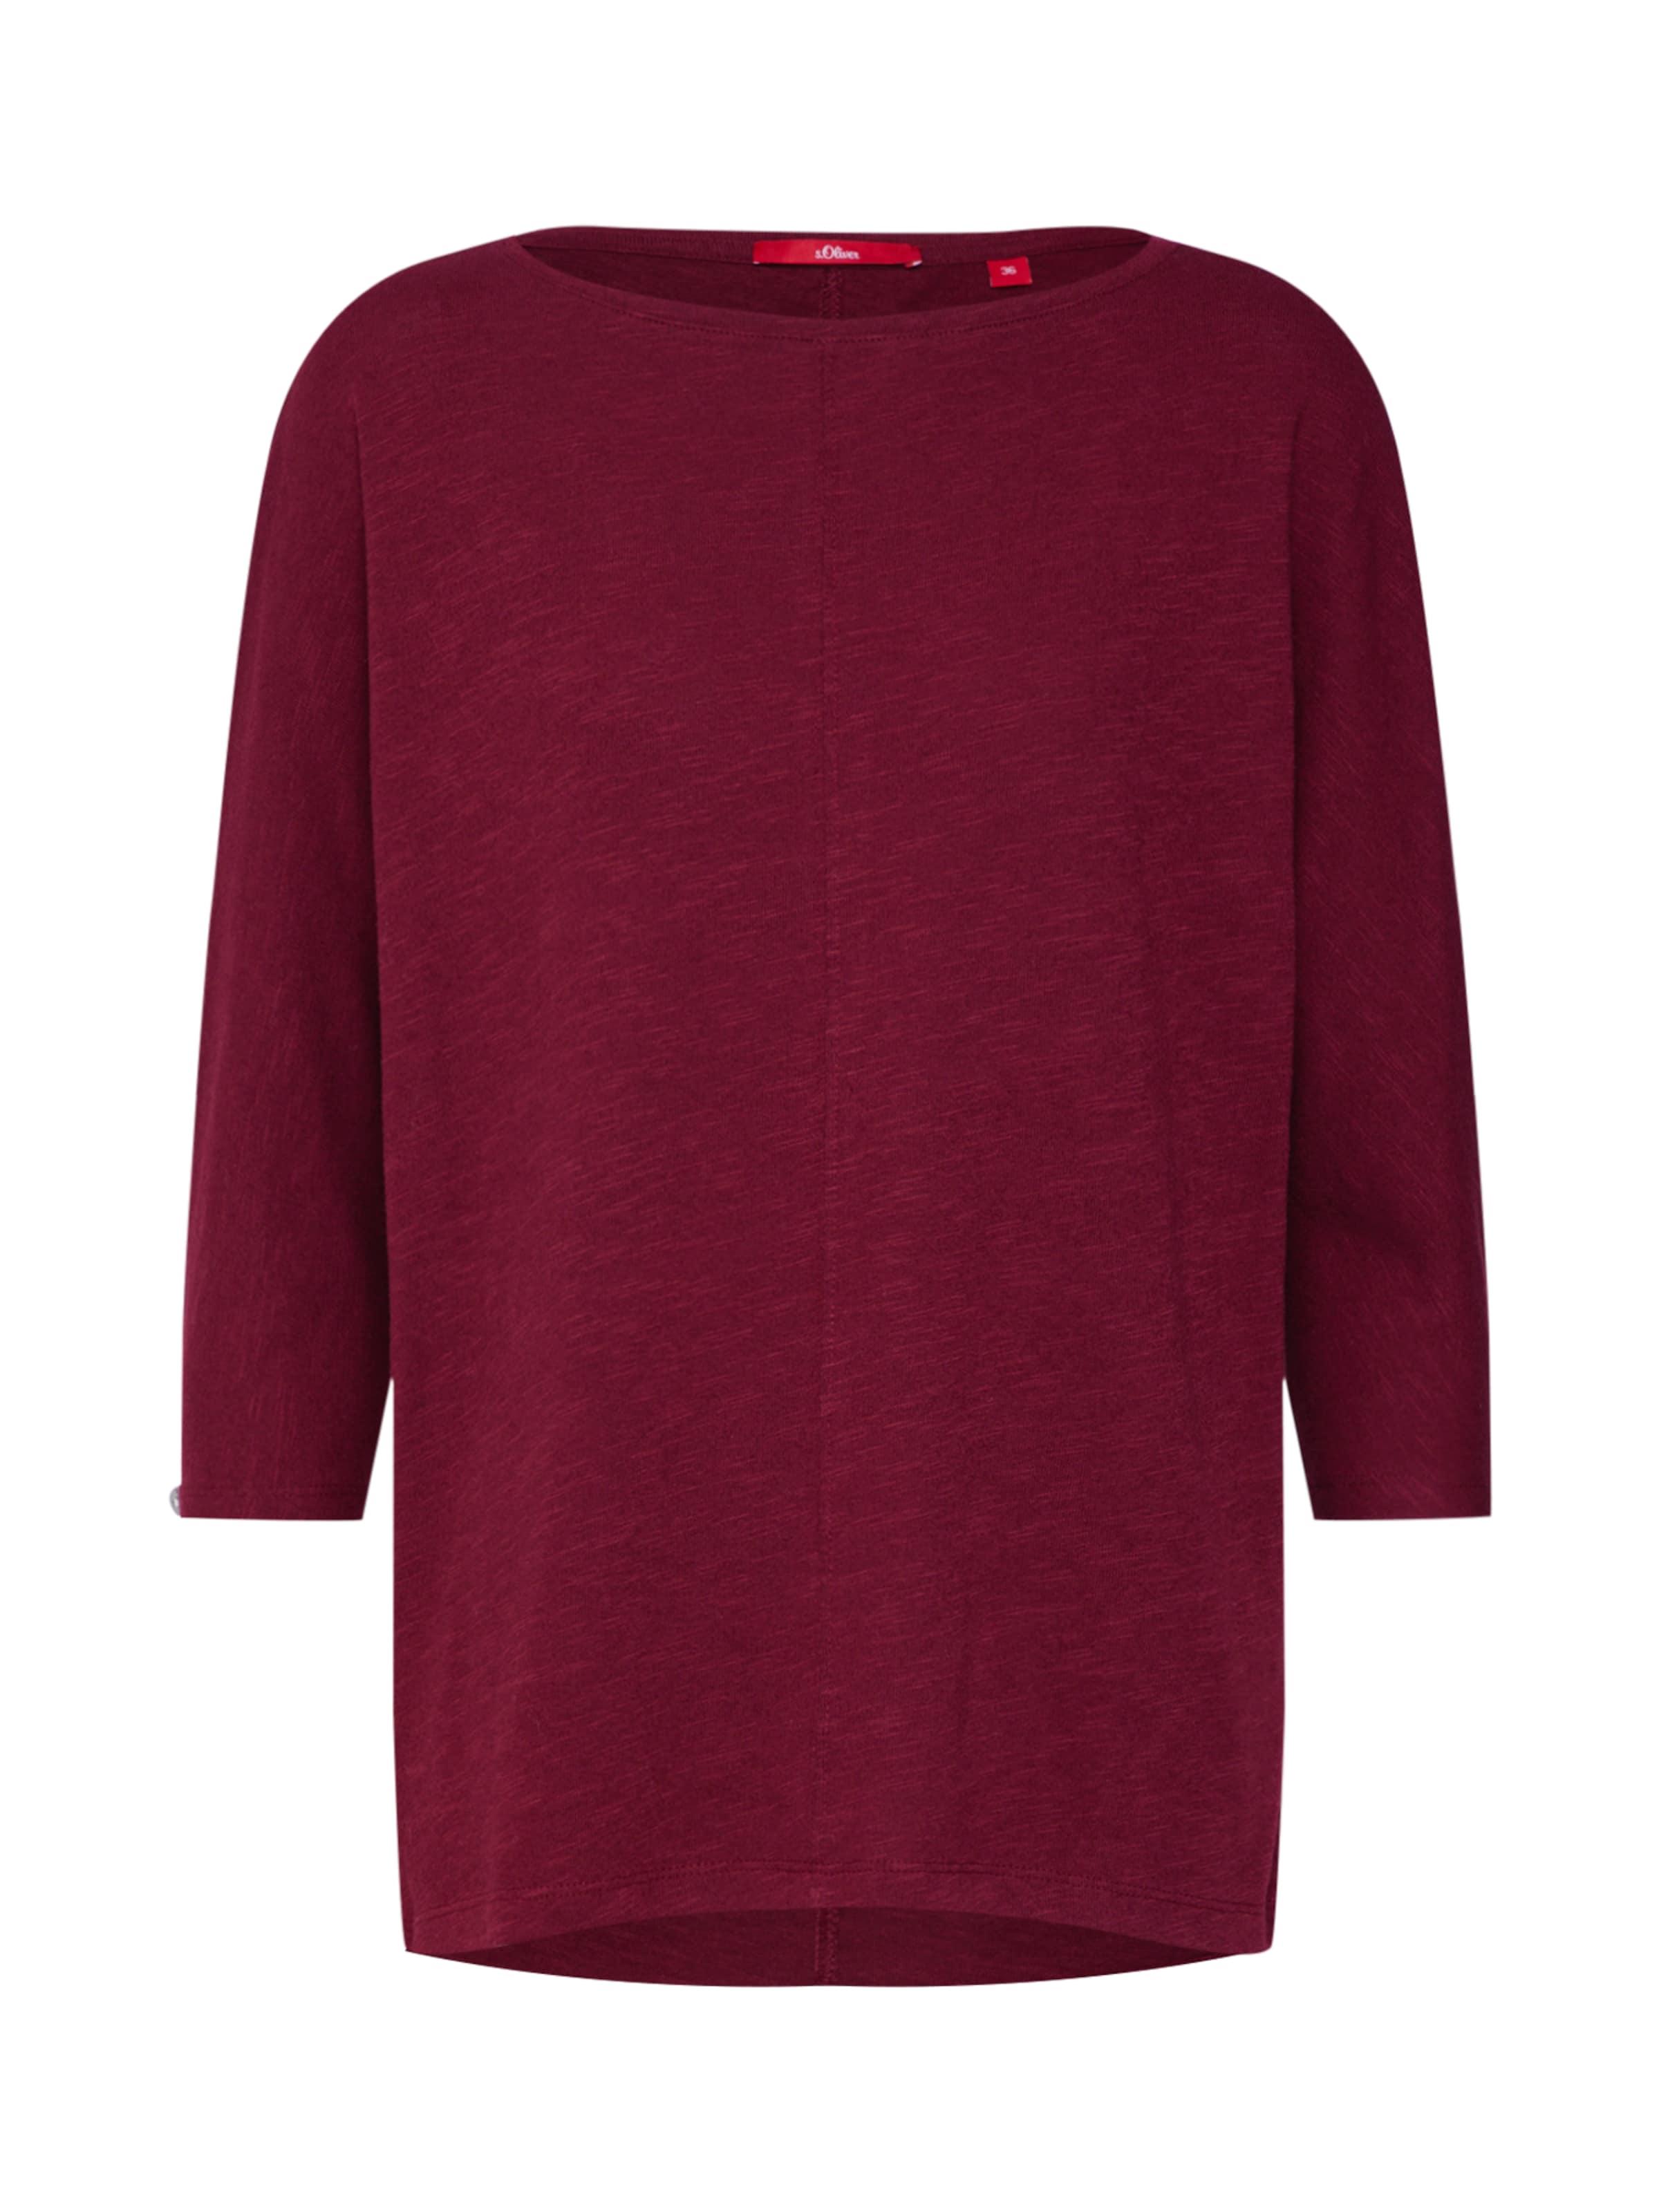 oliver S Bordeaux Red T shirt Label En 3Lj45cARq